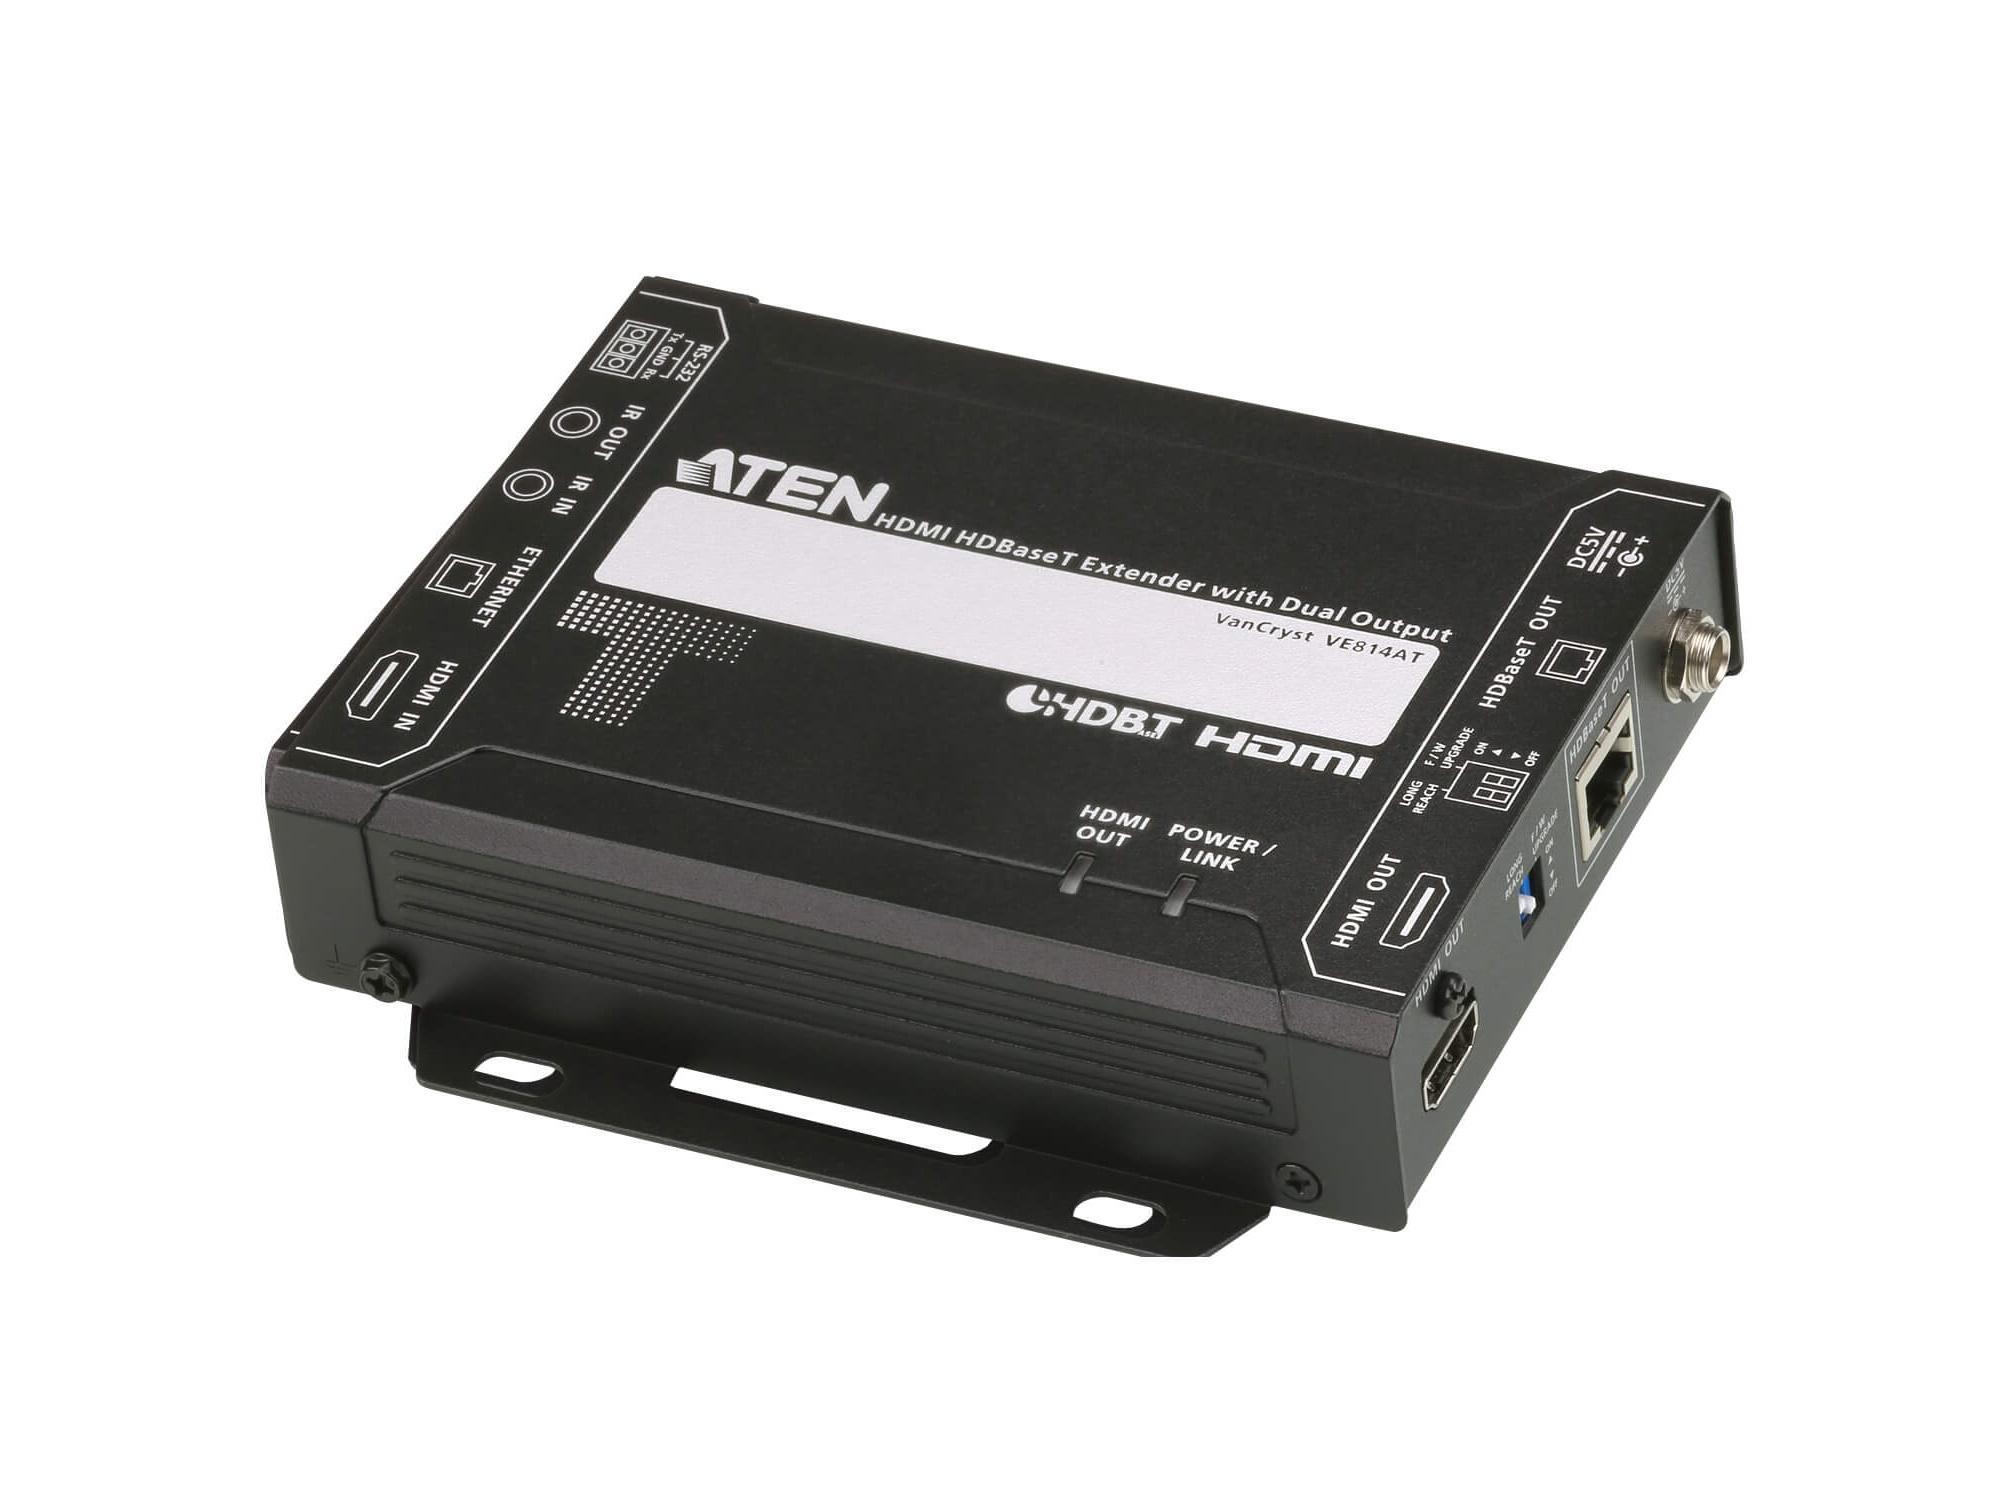 Aten VE814A HDMI HDBaseT Class A Extender (Transmitter/Receiver) Kit with Dual Output (4K/100m)